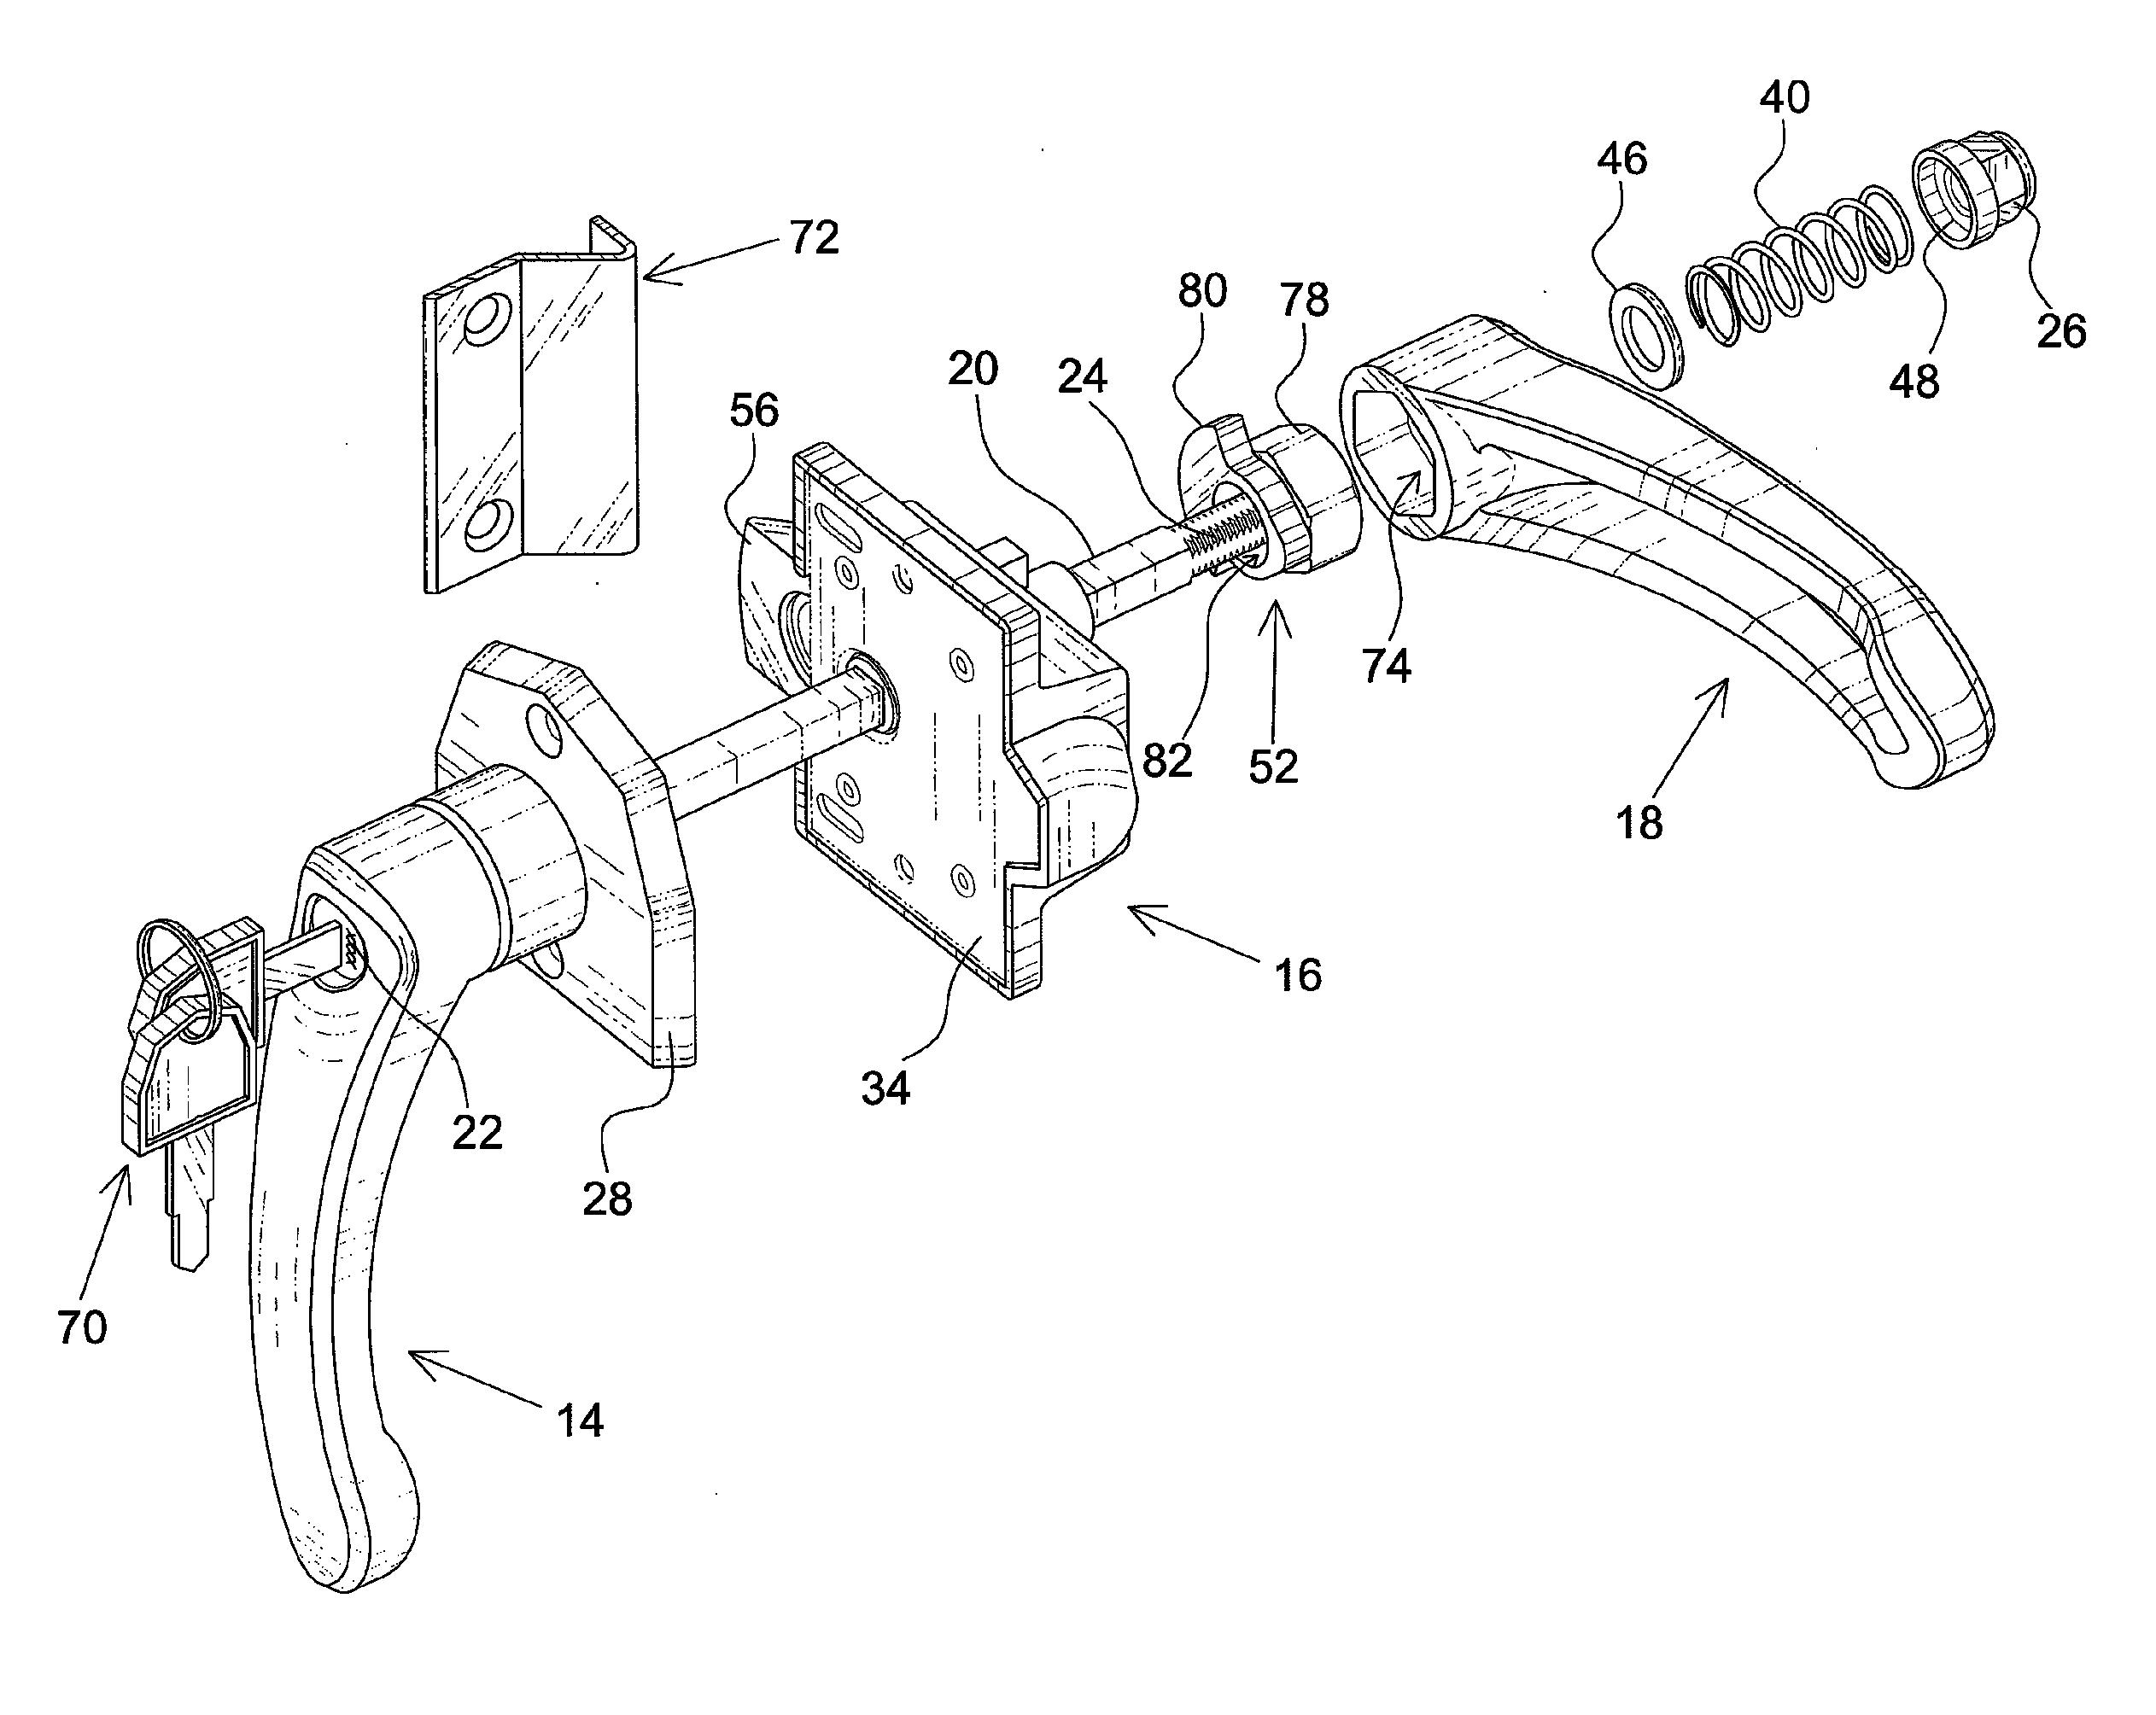 door handle parts diagram fender elite stratocaster hss wiring kwikset knob imageresizertool com